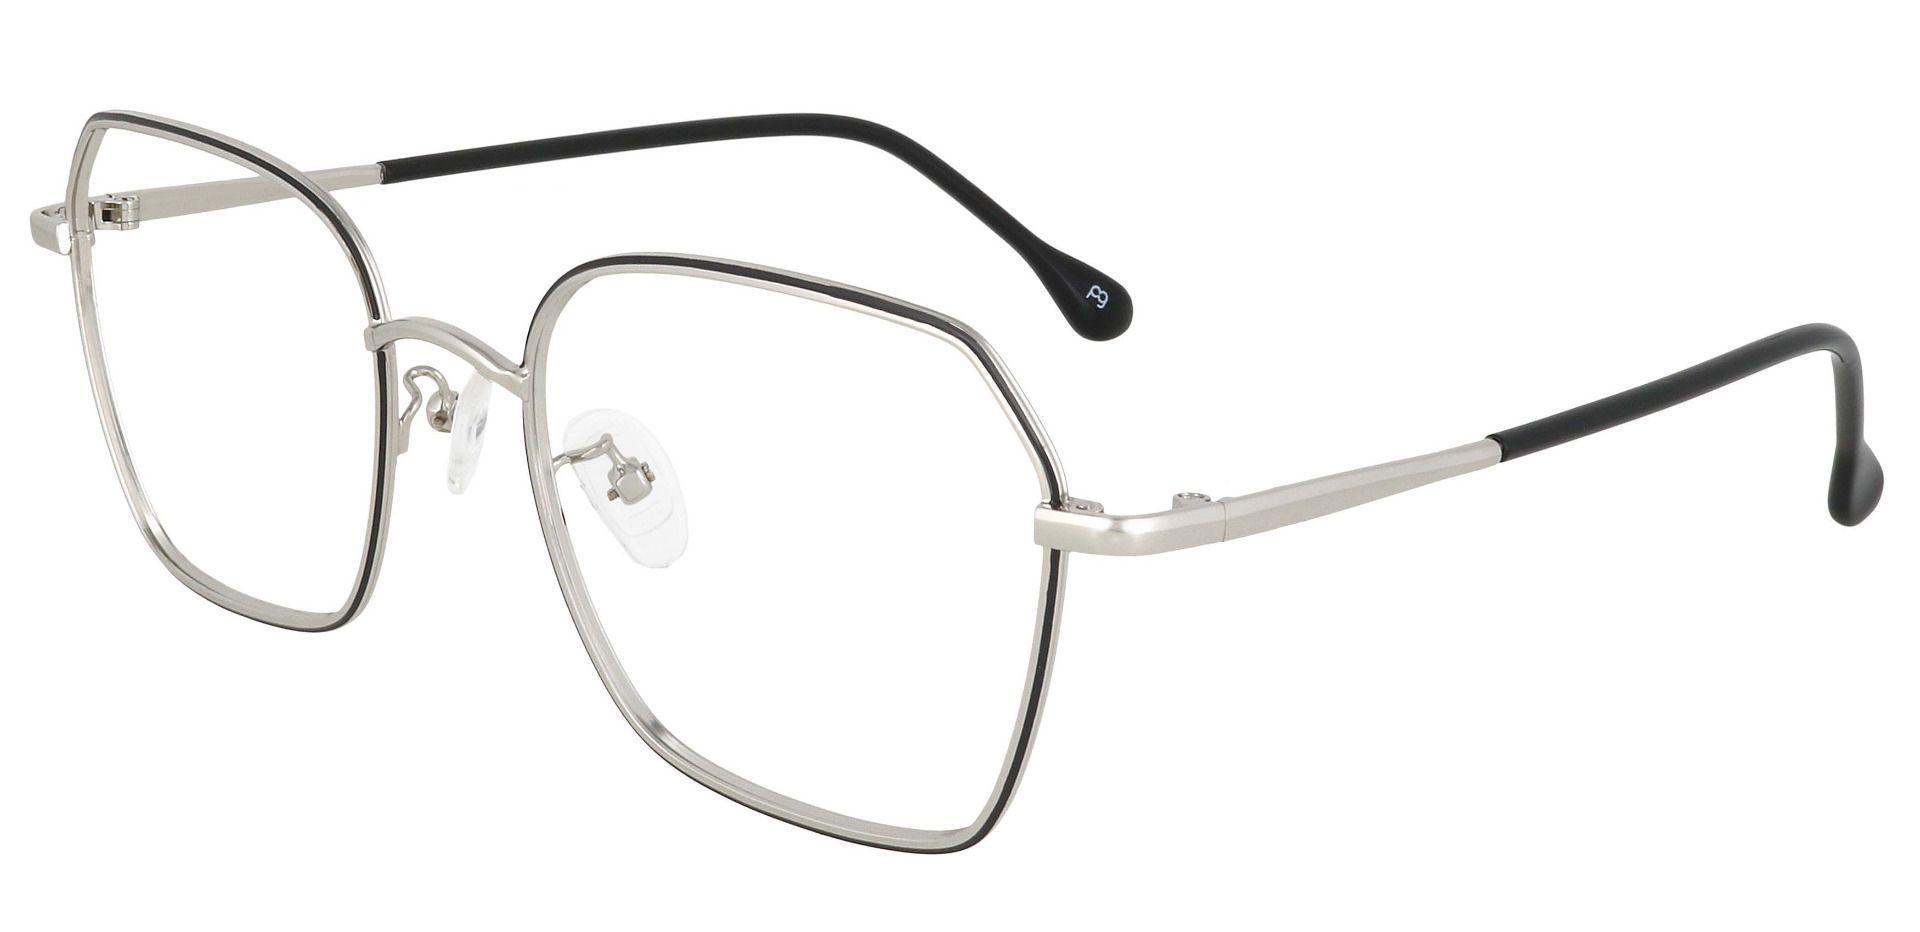 Charlotte Square Prescription Glasses - Black